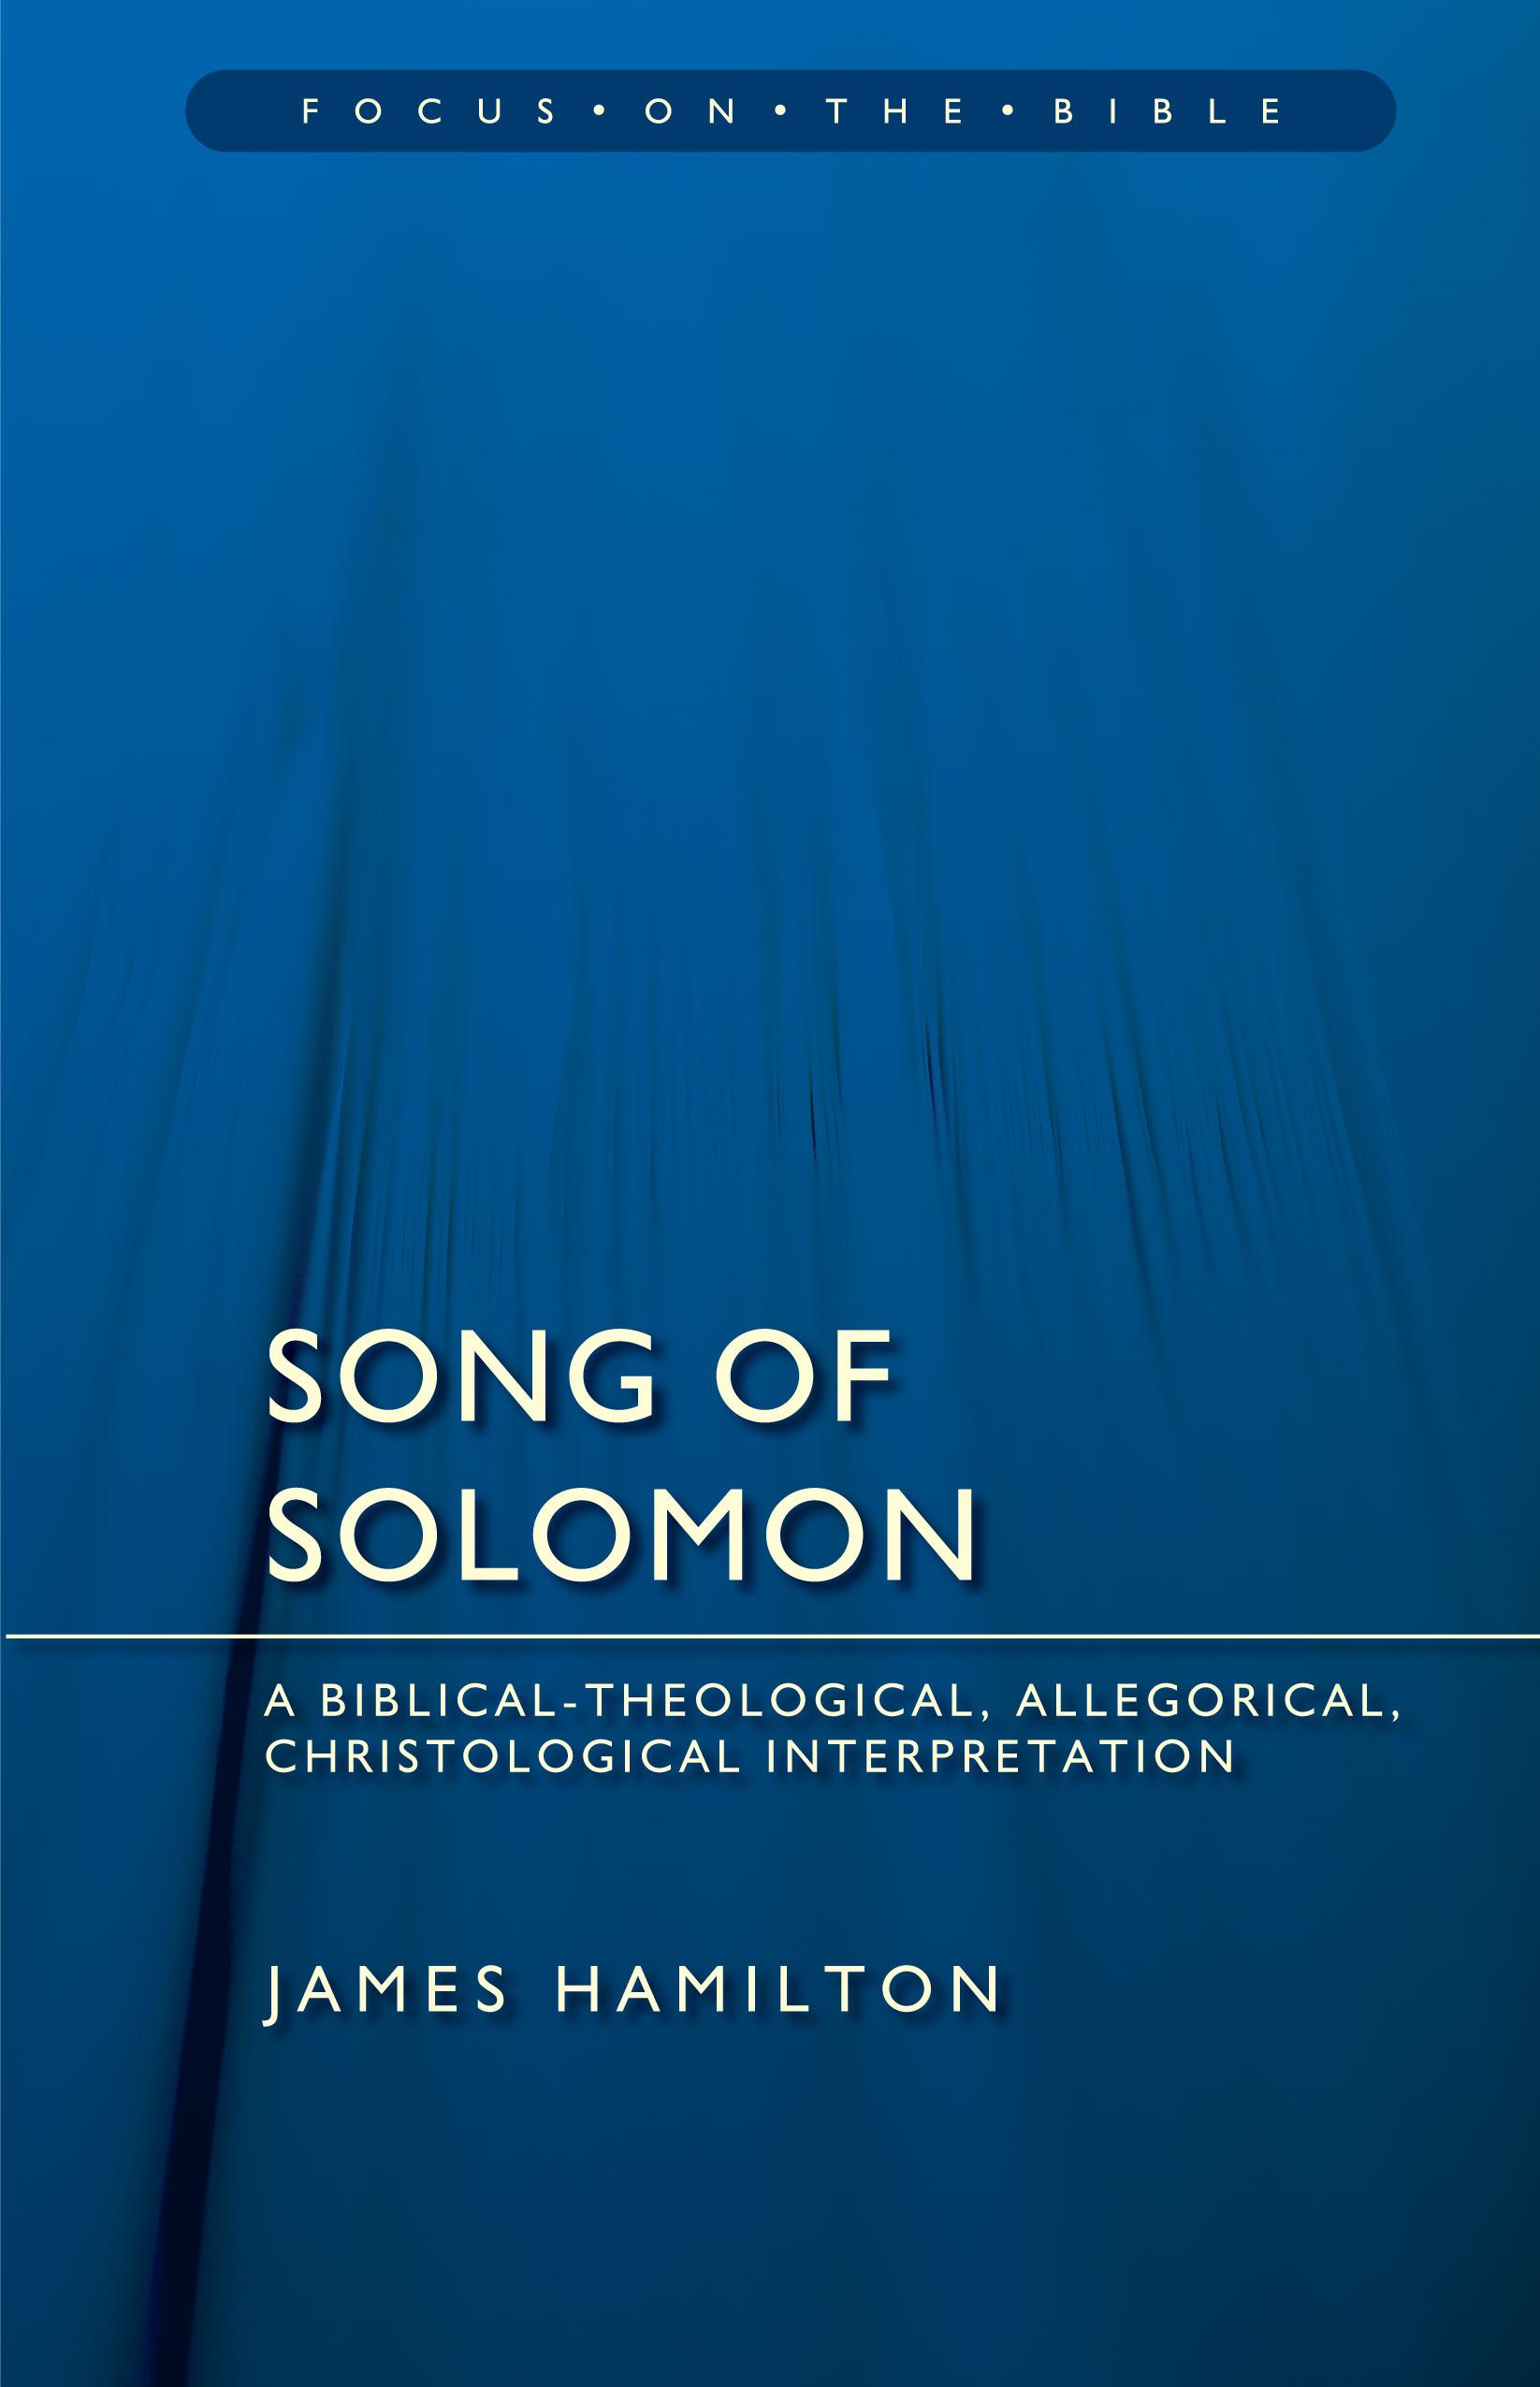 Song of Songs: A Biblical-Theological, Allegorical, Christological Interpretation